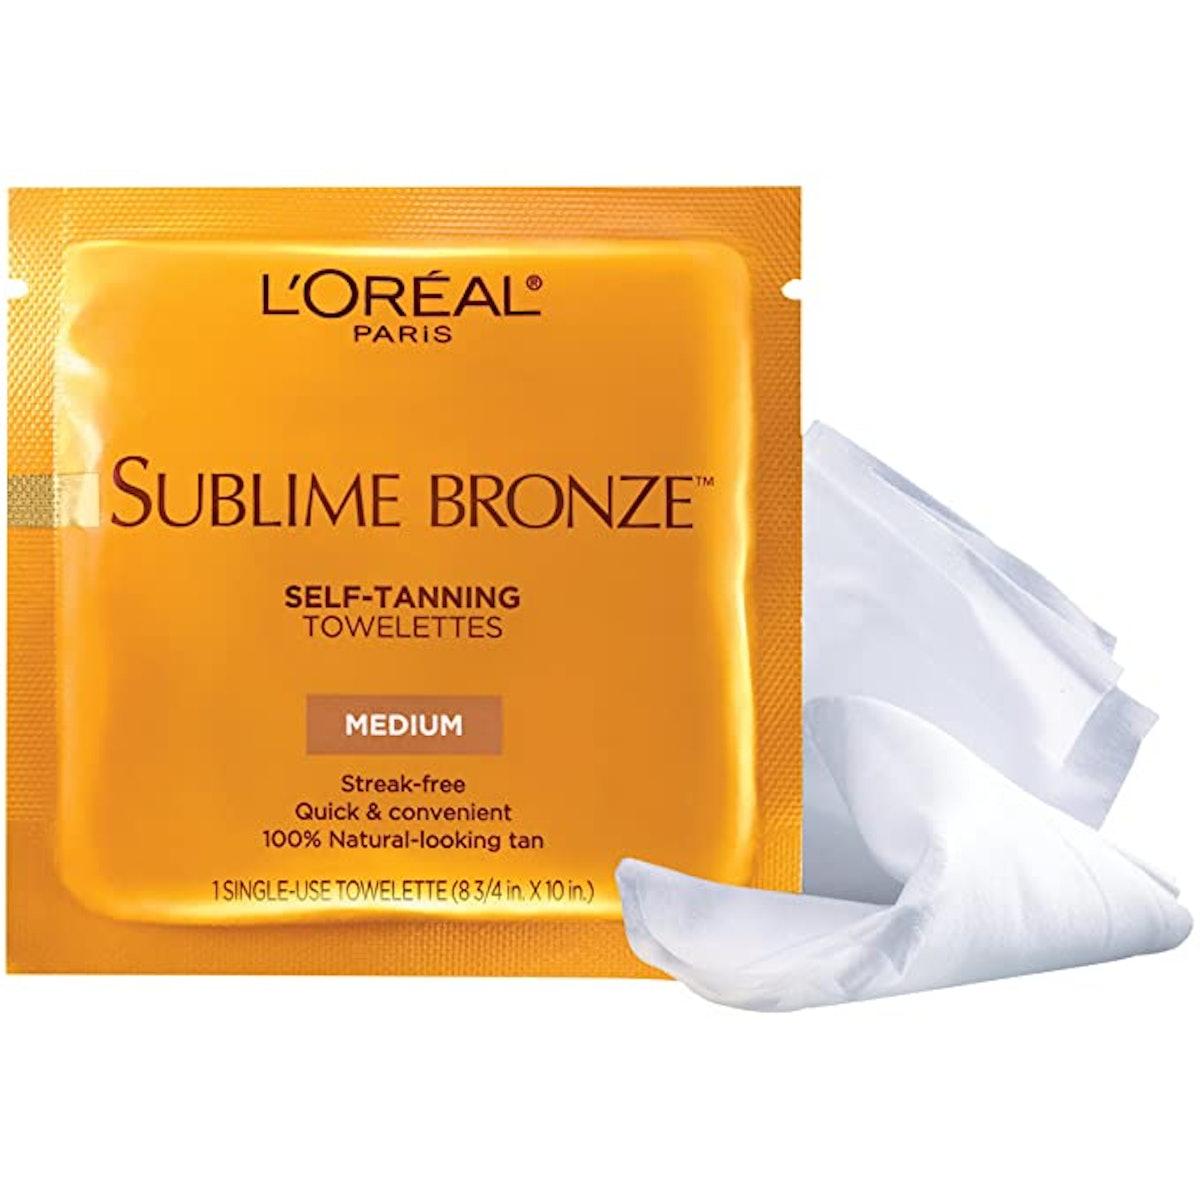 L'Oreal Paris Skincare Sublime Bronze Self-Tanning Towelettes (6 Count)